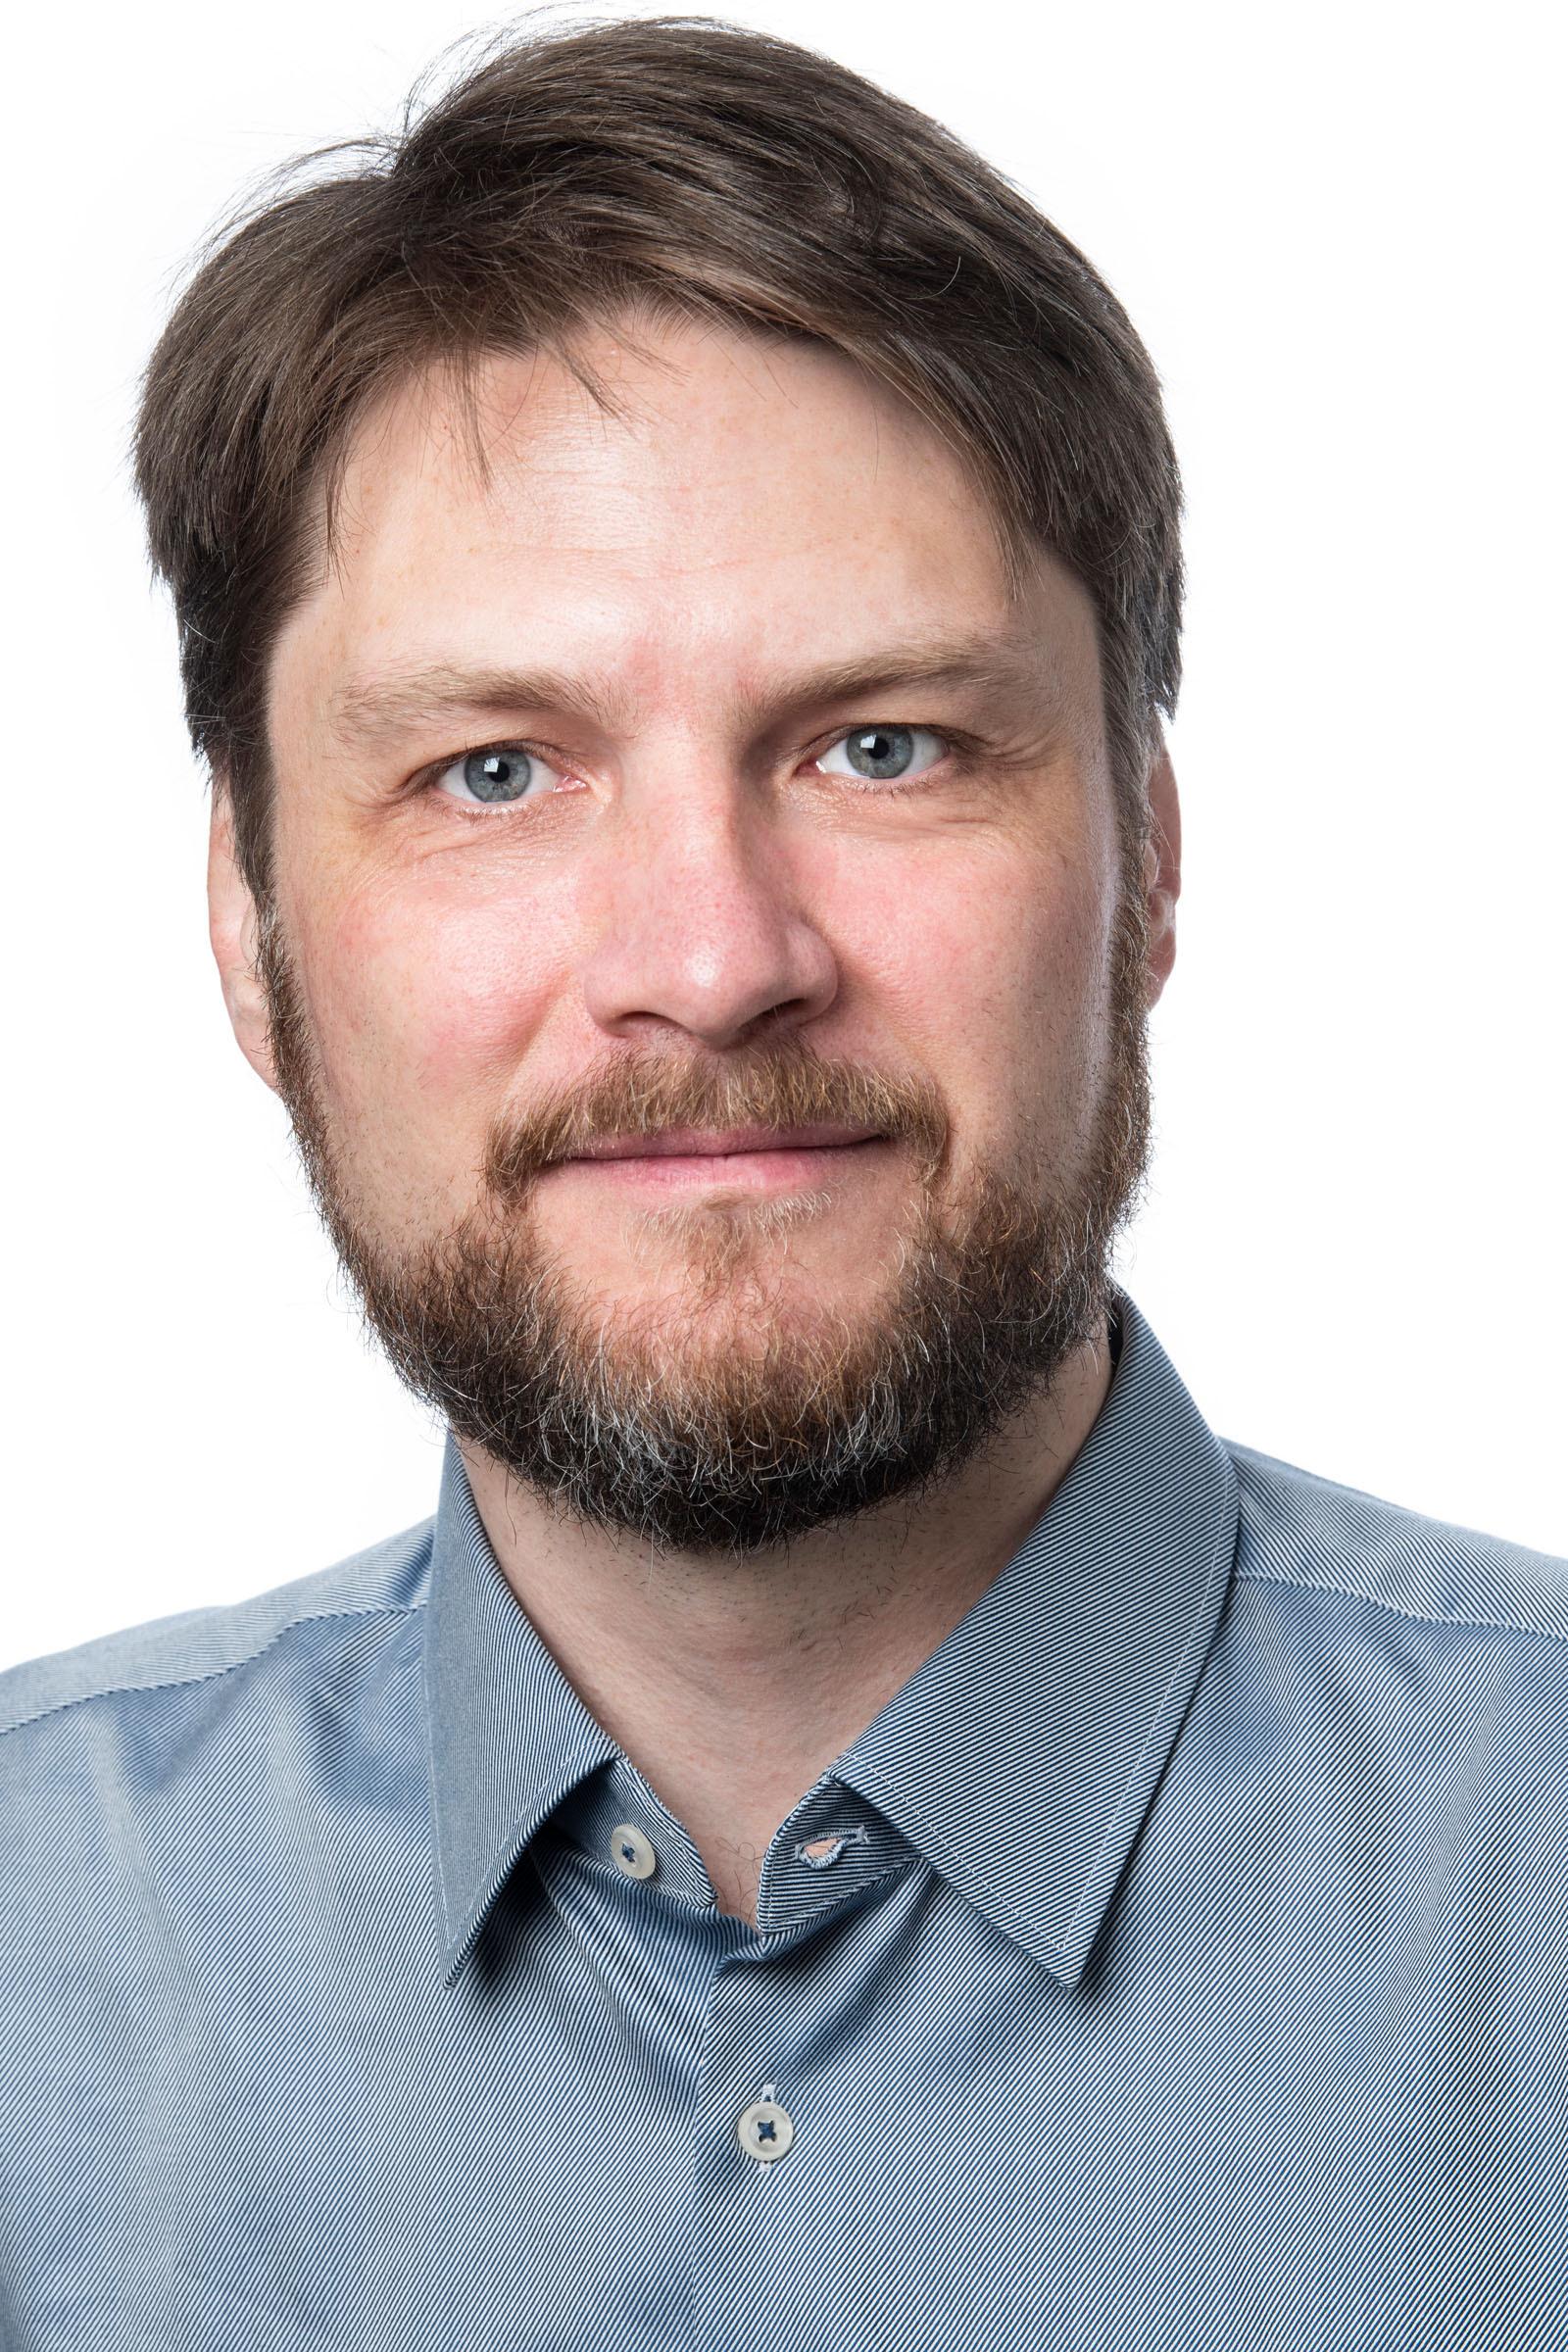 Profile picture of Erik Baekkeskov